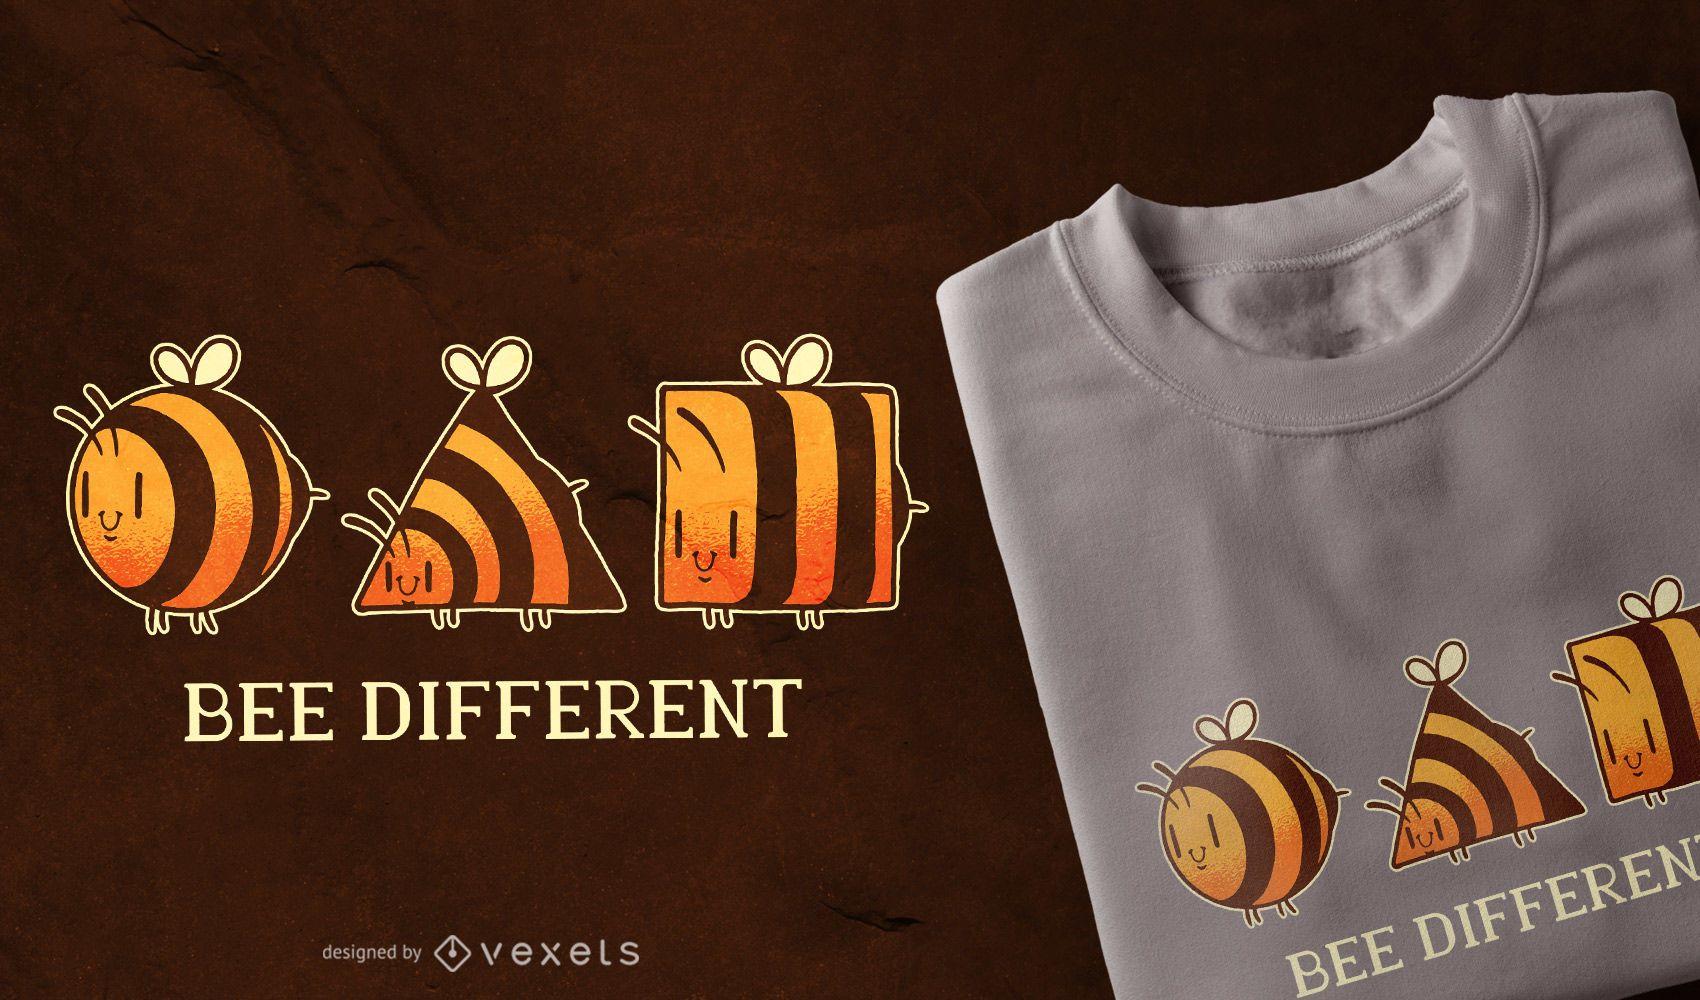 Design diferente de camisetas Bee